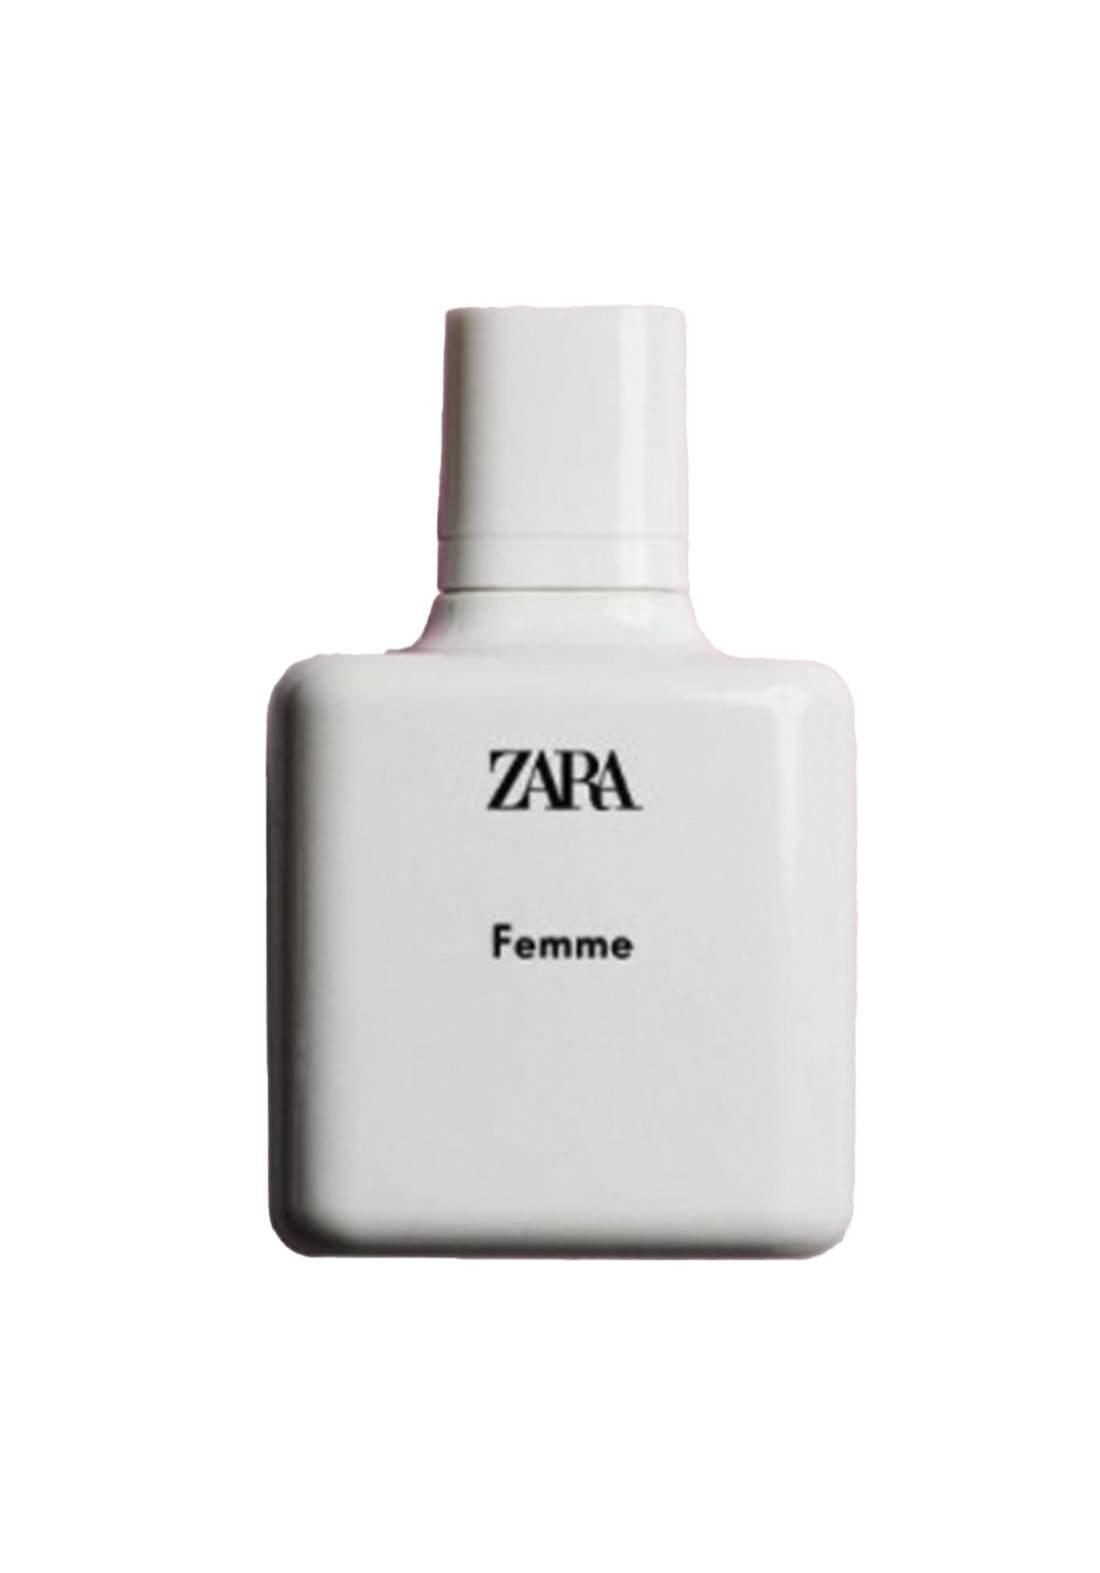 Zara Femme Edt 100 Ml